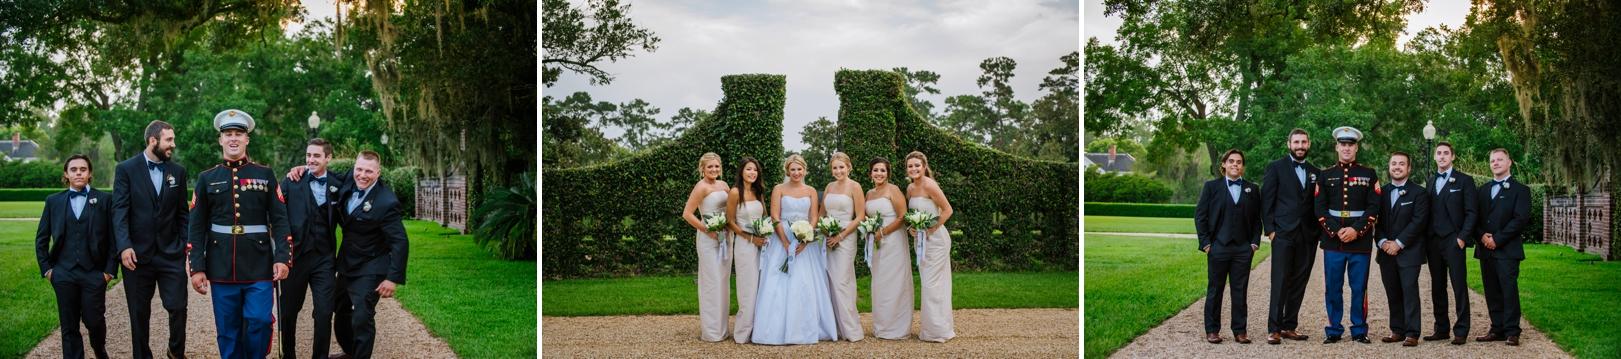 preppy-southern-plantation-wedding-georgia_0025.jpg